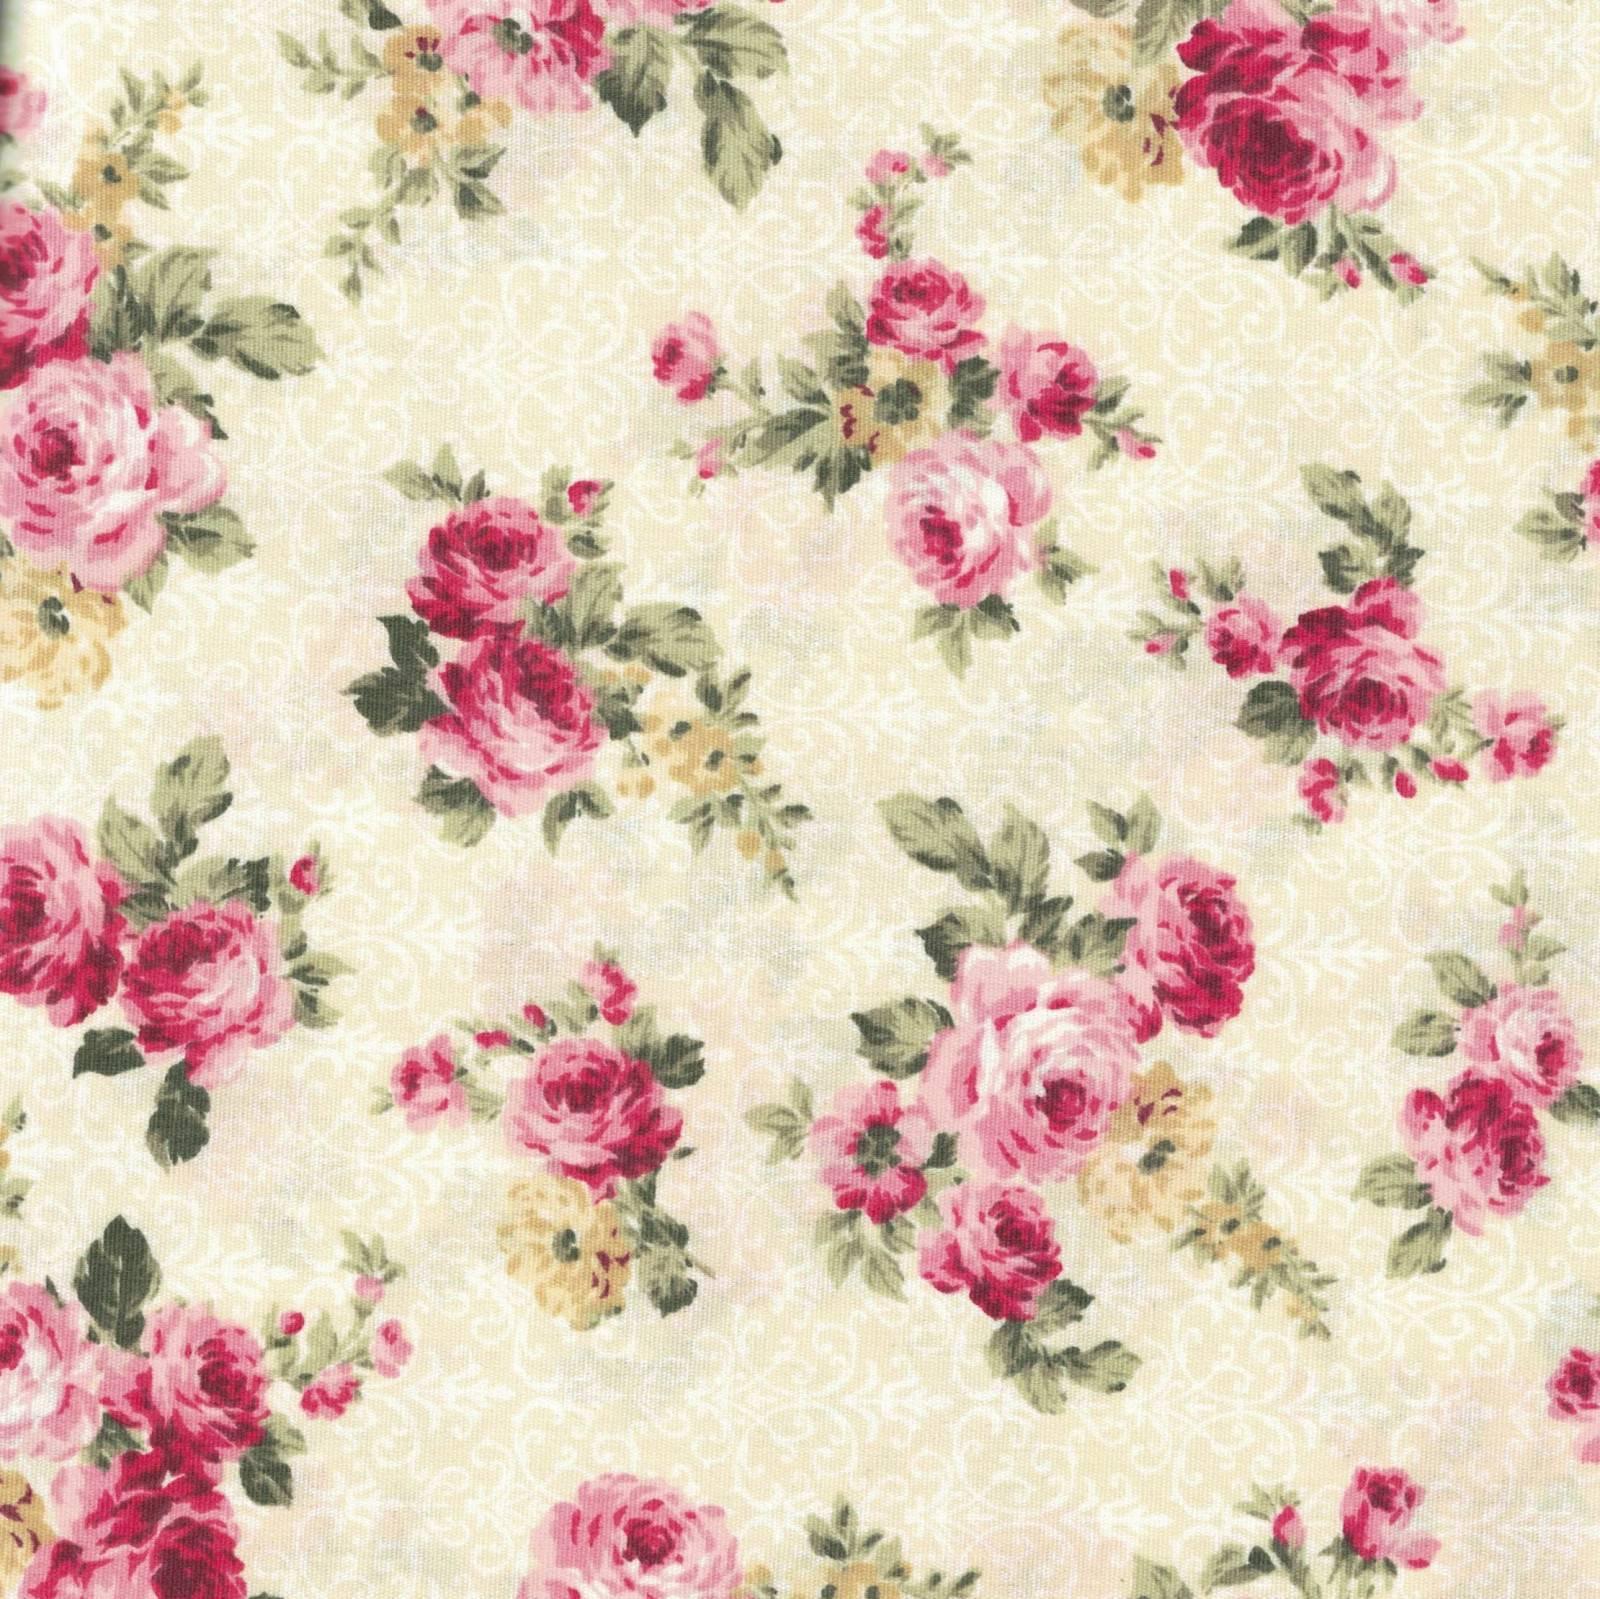 Floral Arabesque Creme Ref. 9902 Fabricart - Armarinhos Nodari